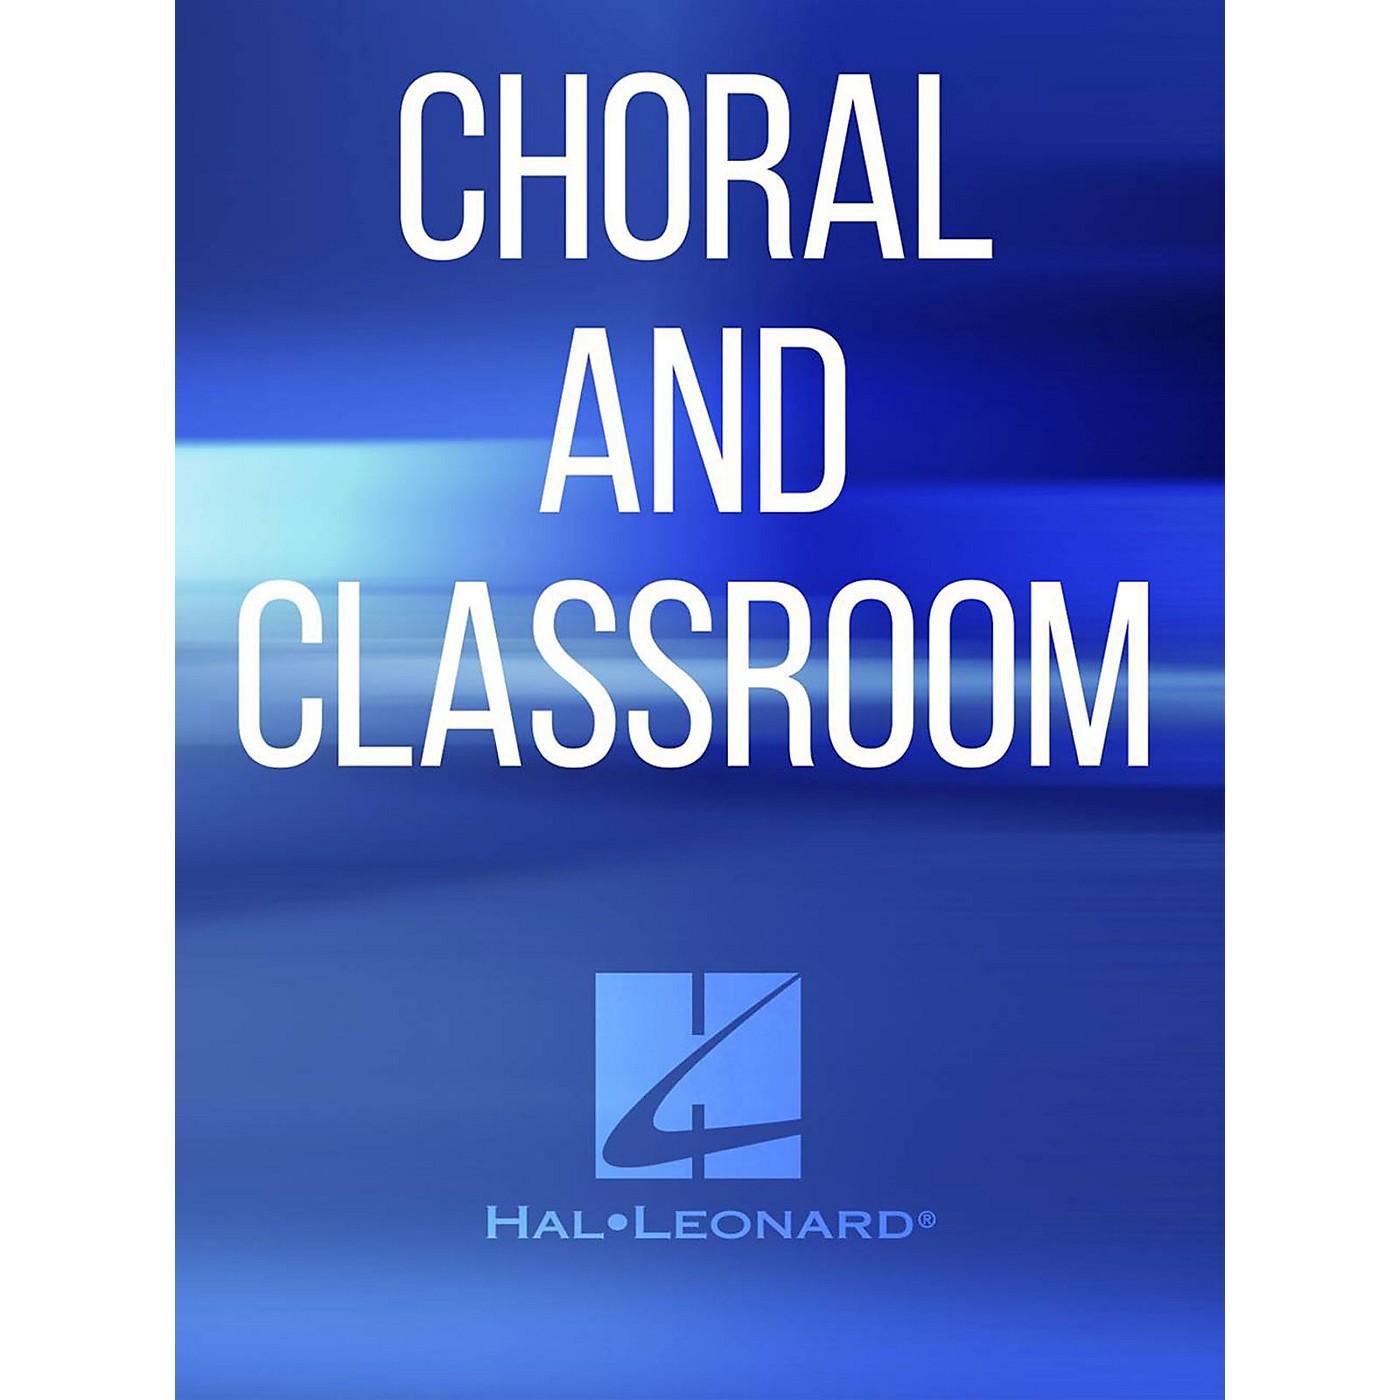 Hal Leonard When I Survey the Wondrous Cross Organ Composed by Walter May thumbnail